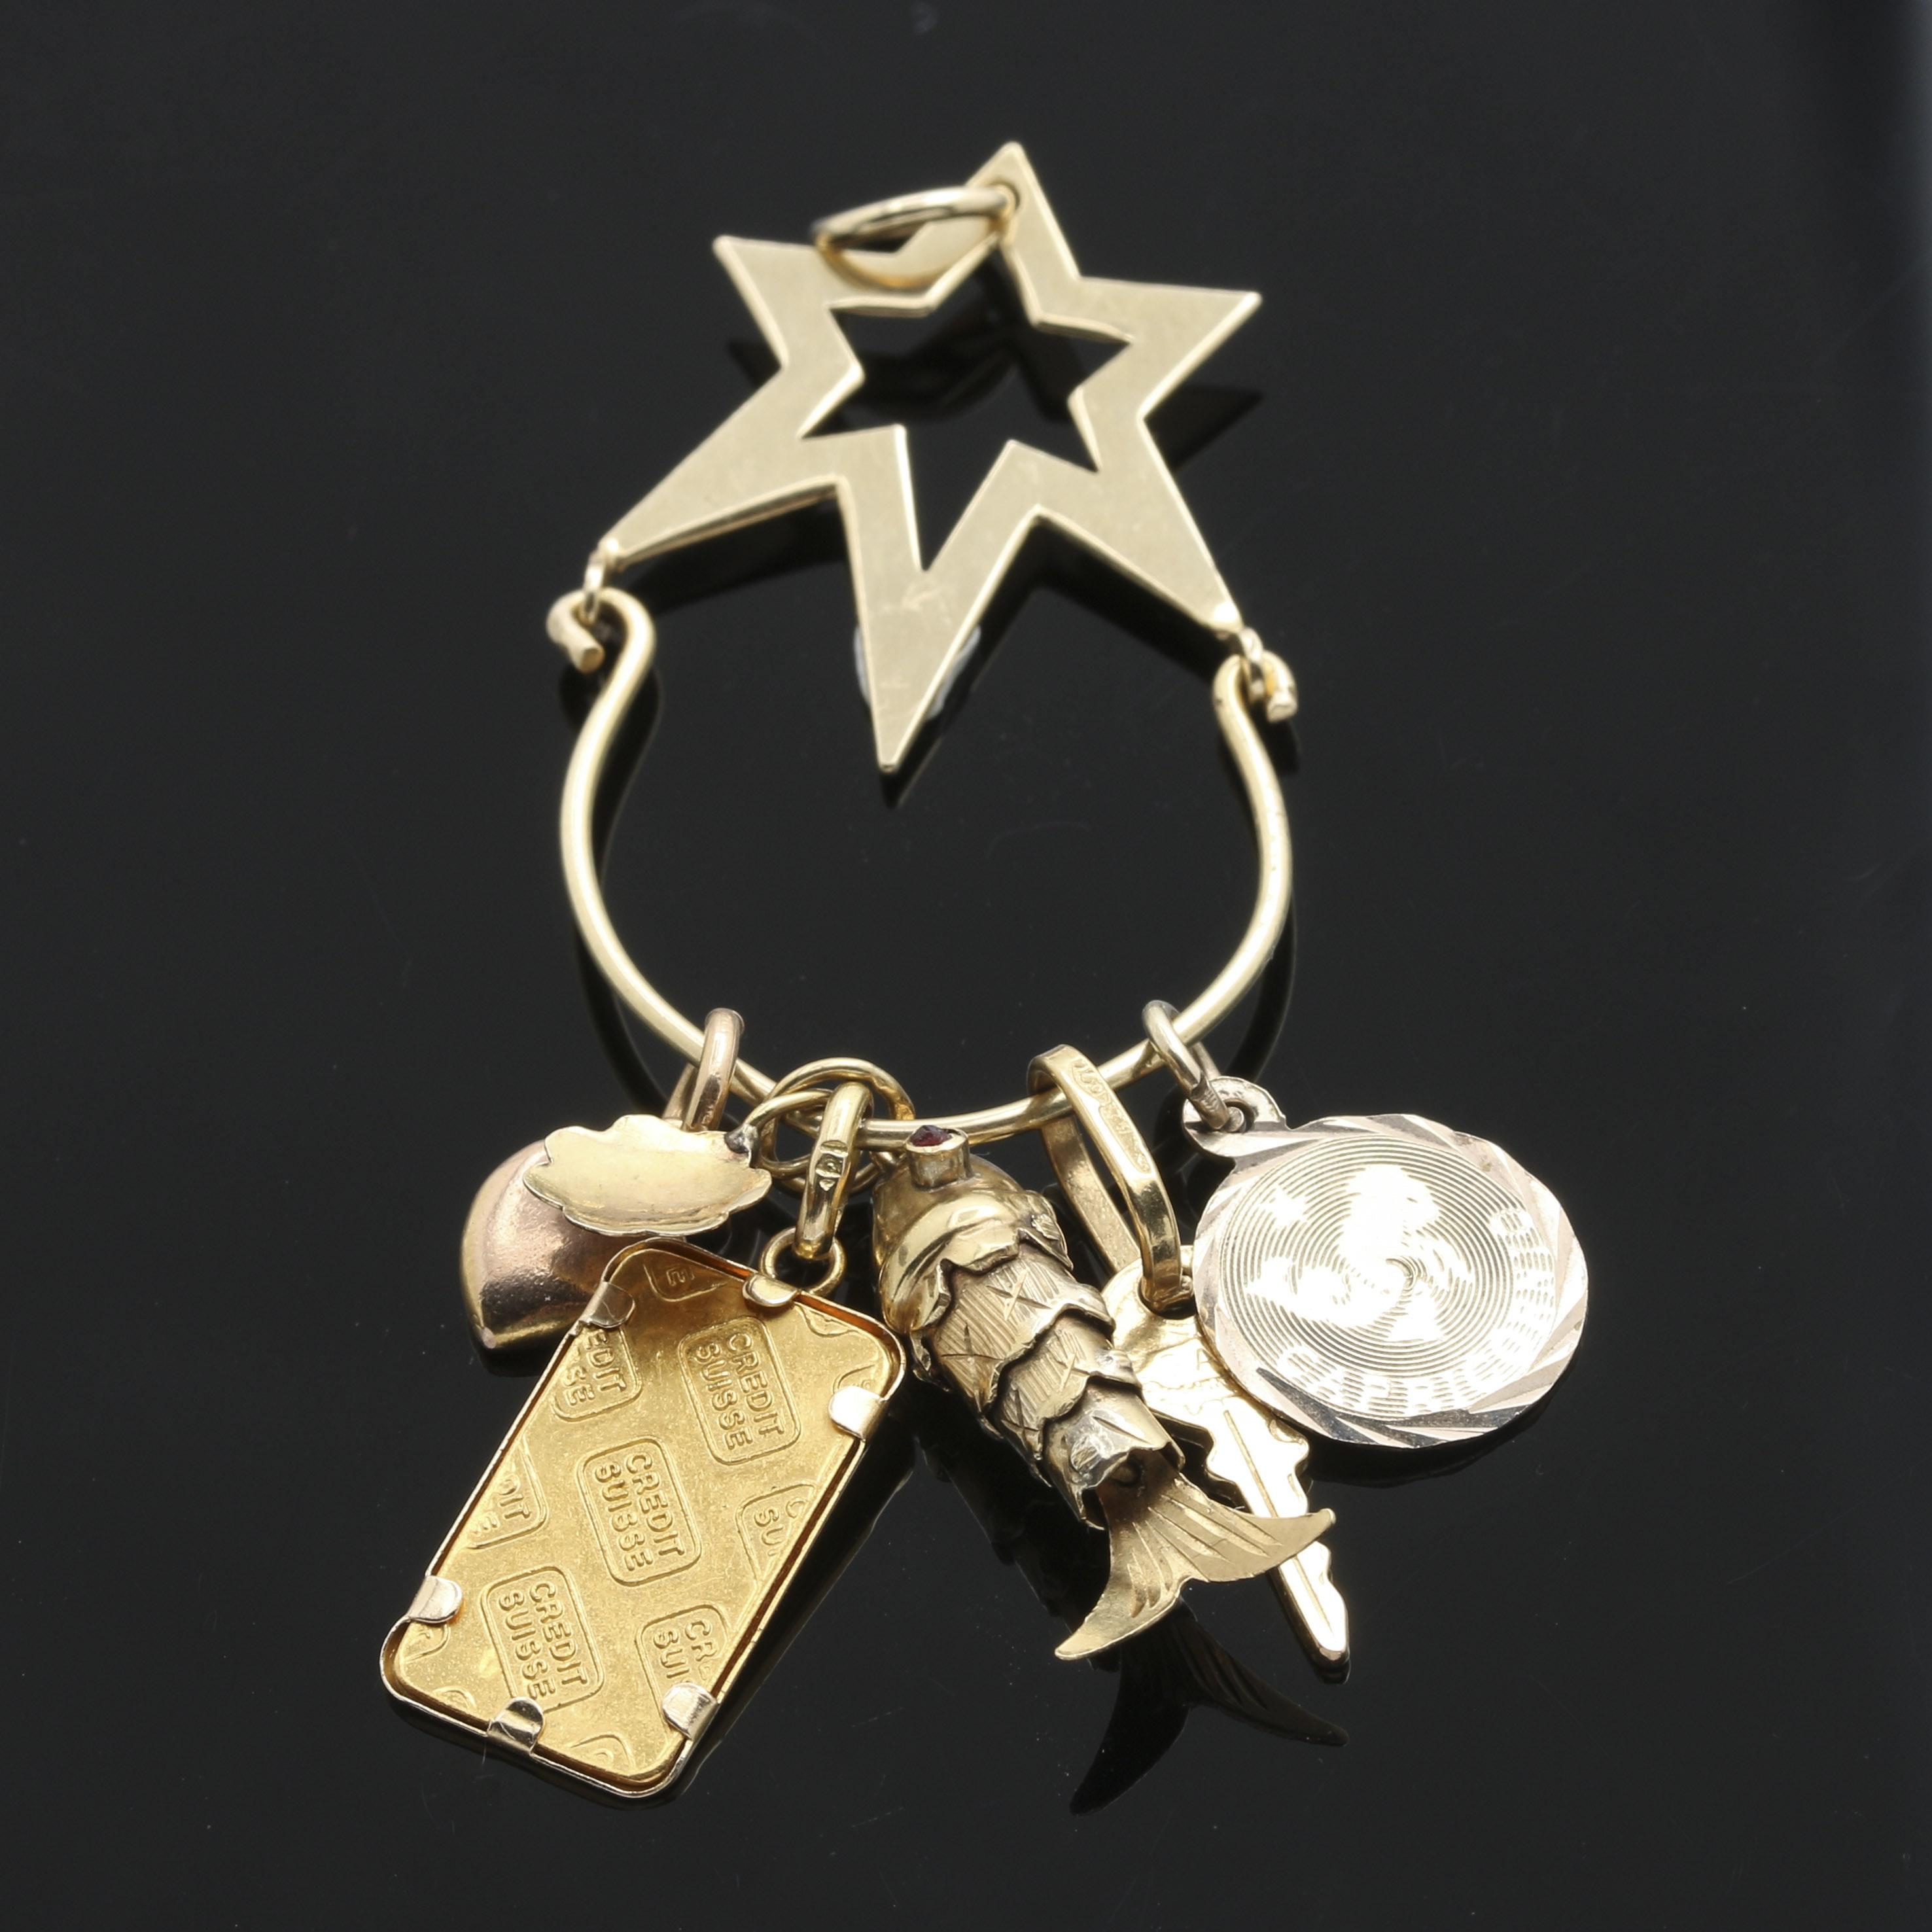 14K Yellow Gold Charm Holder Pendant